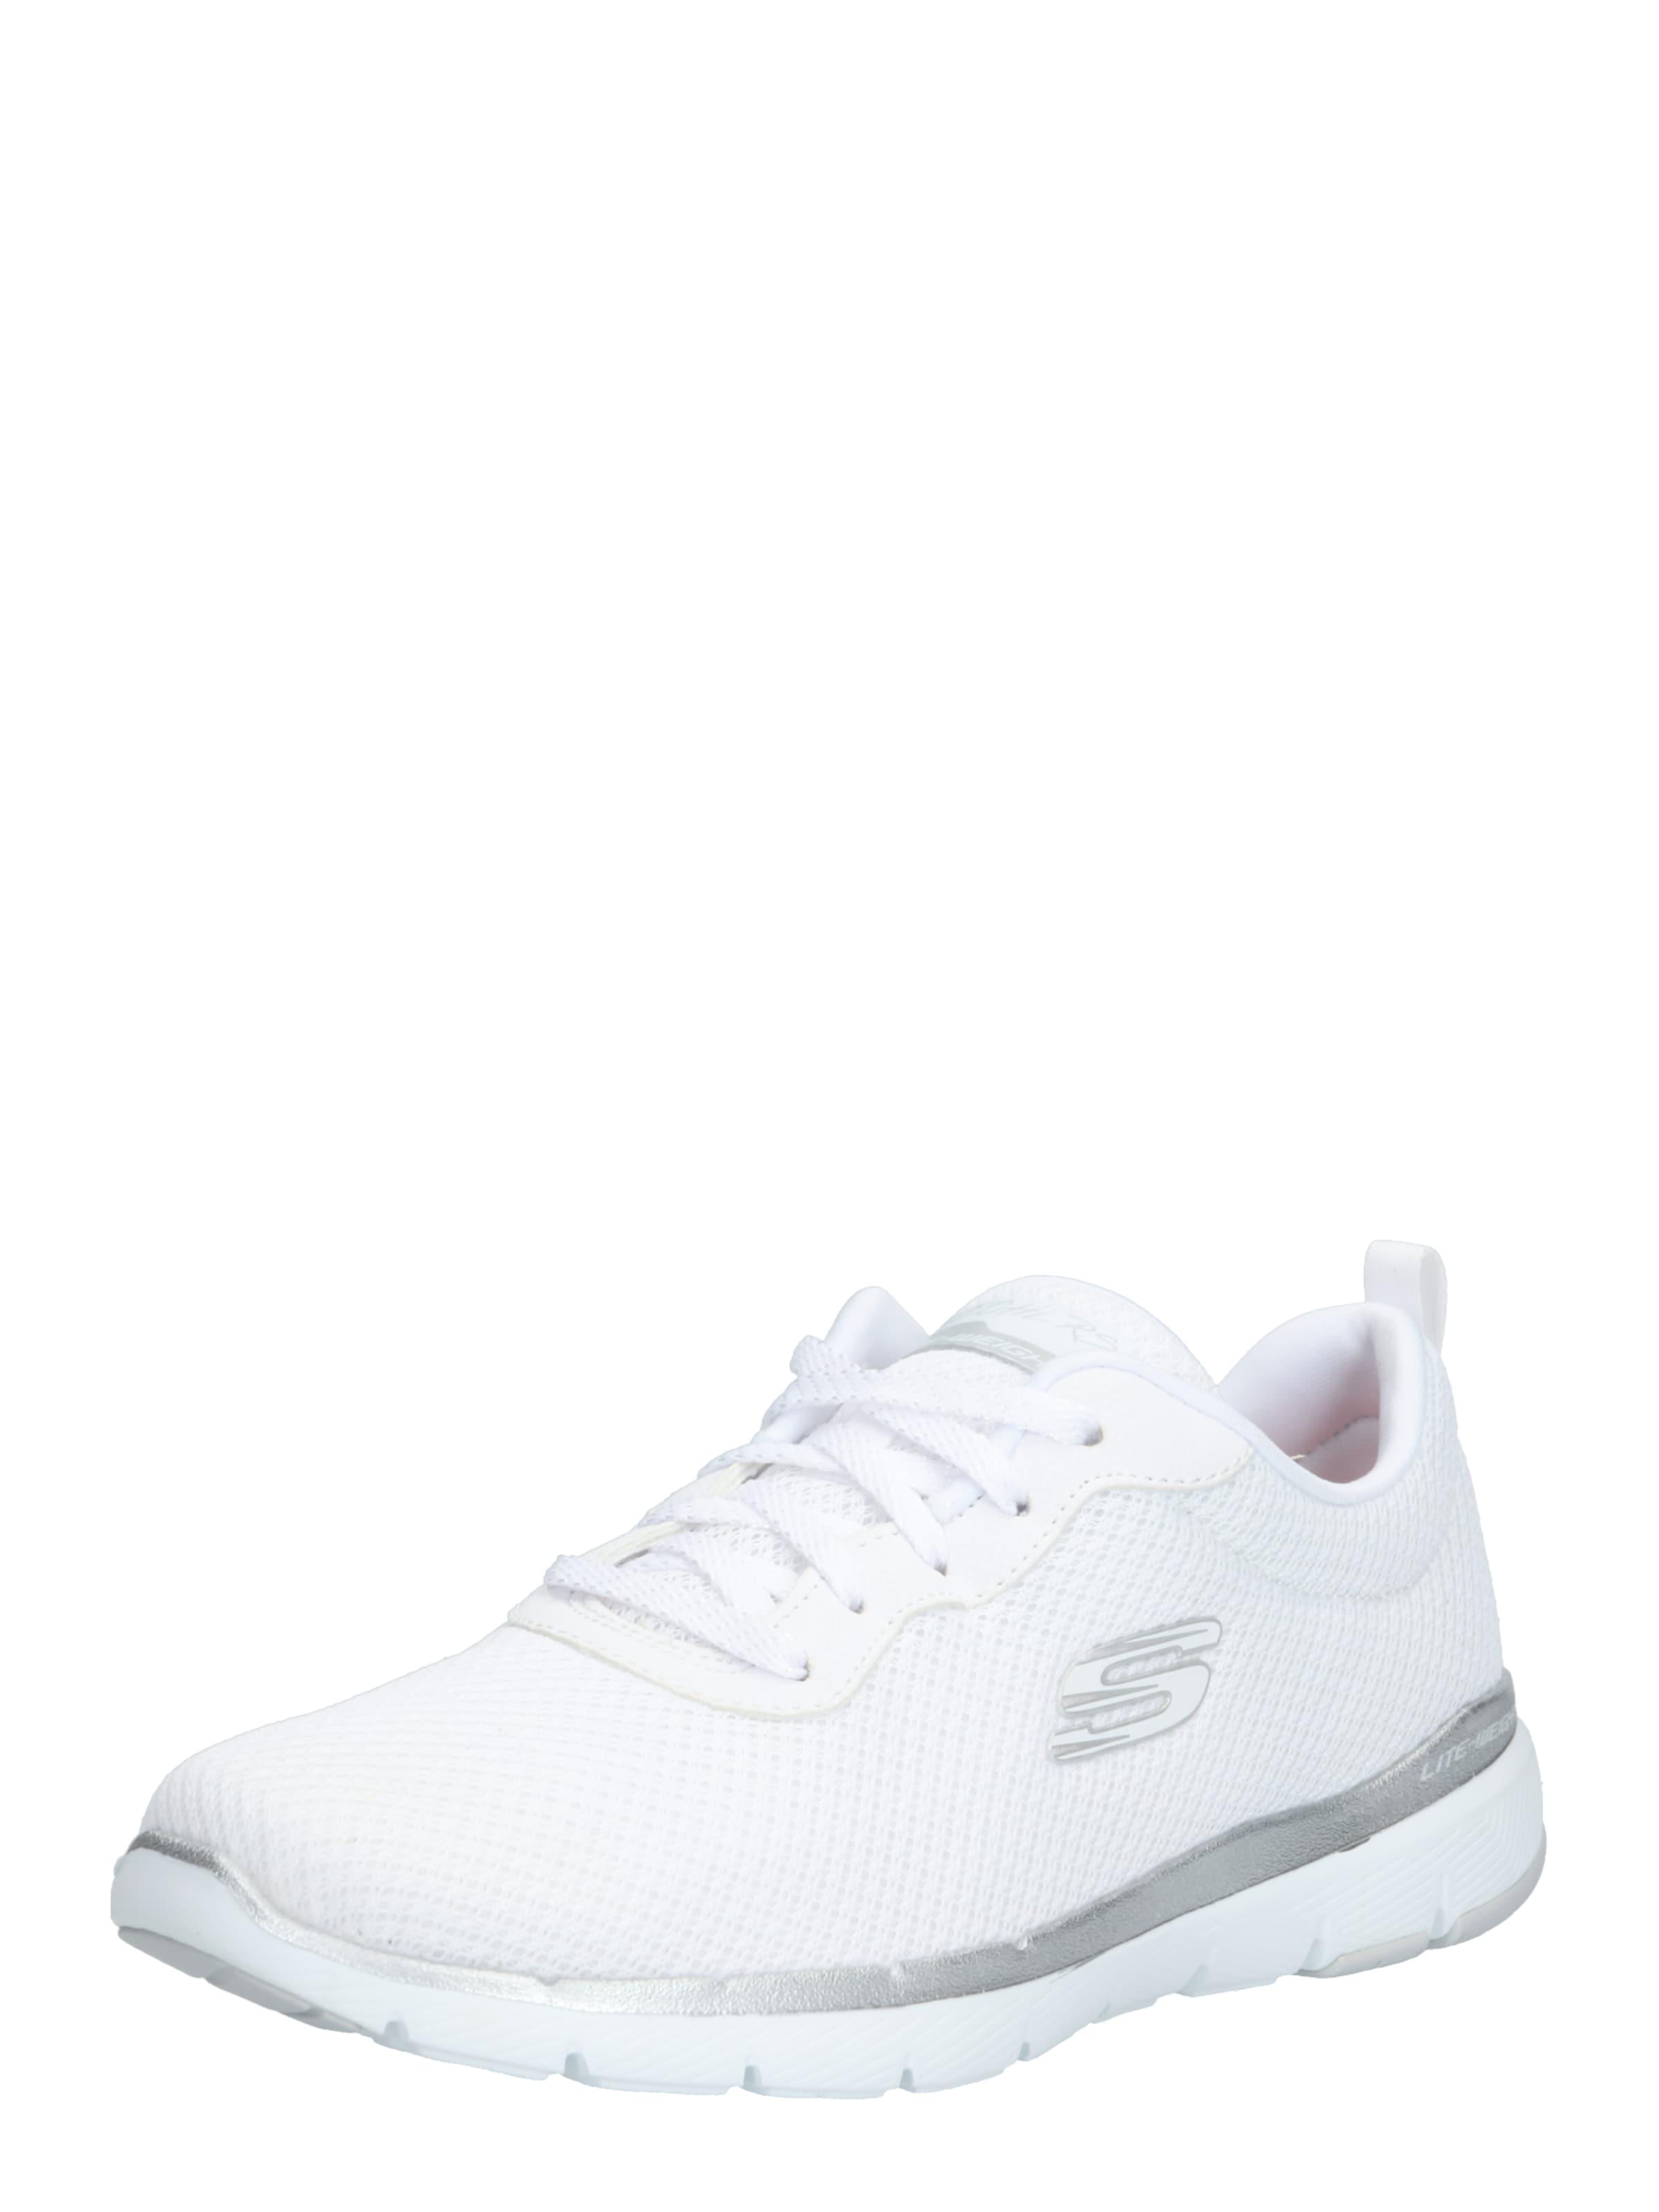 3 'flex Blanc Basses En 0' Skechers Baskets Appeal Y7bv6gfy